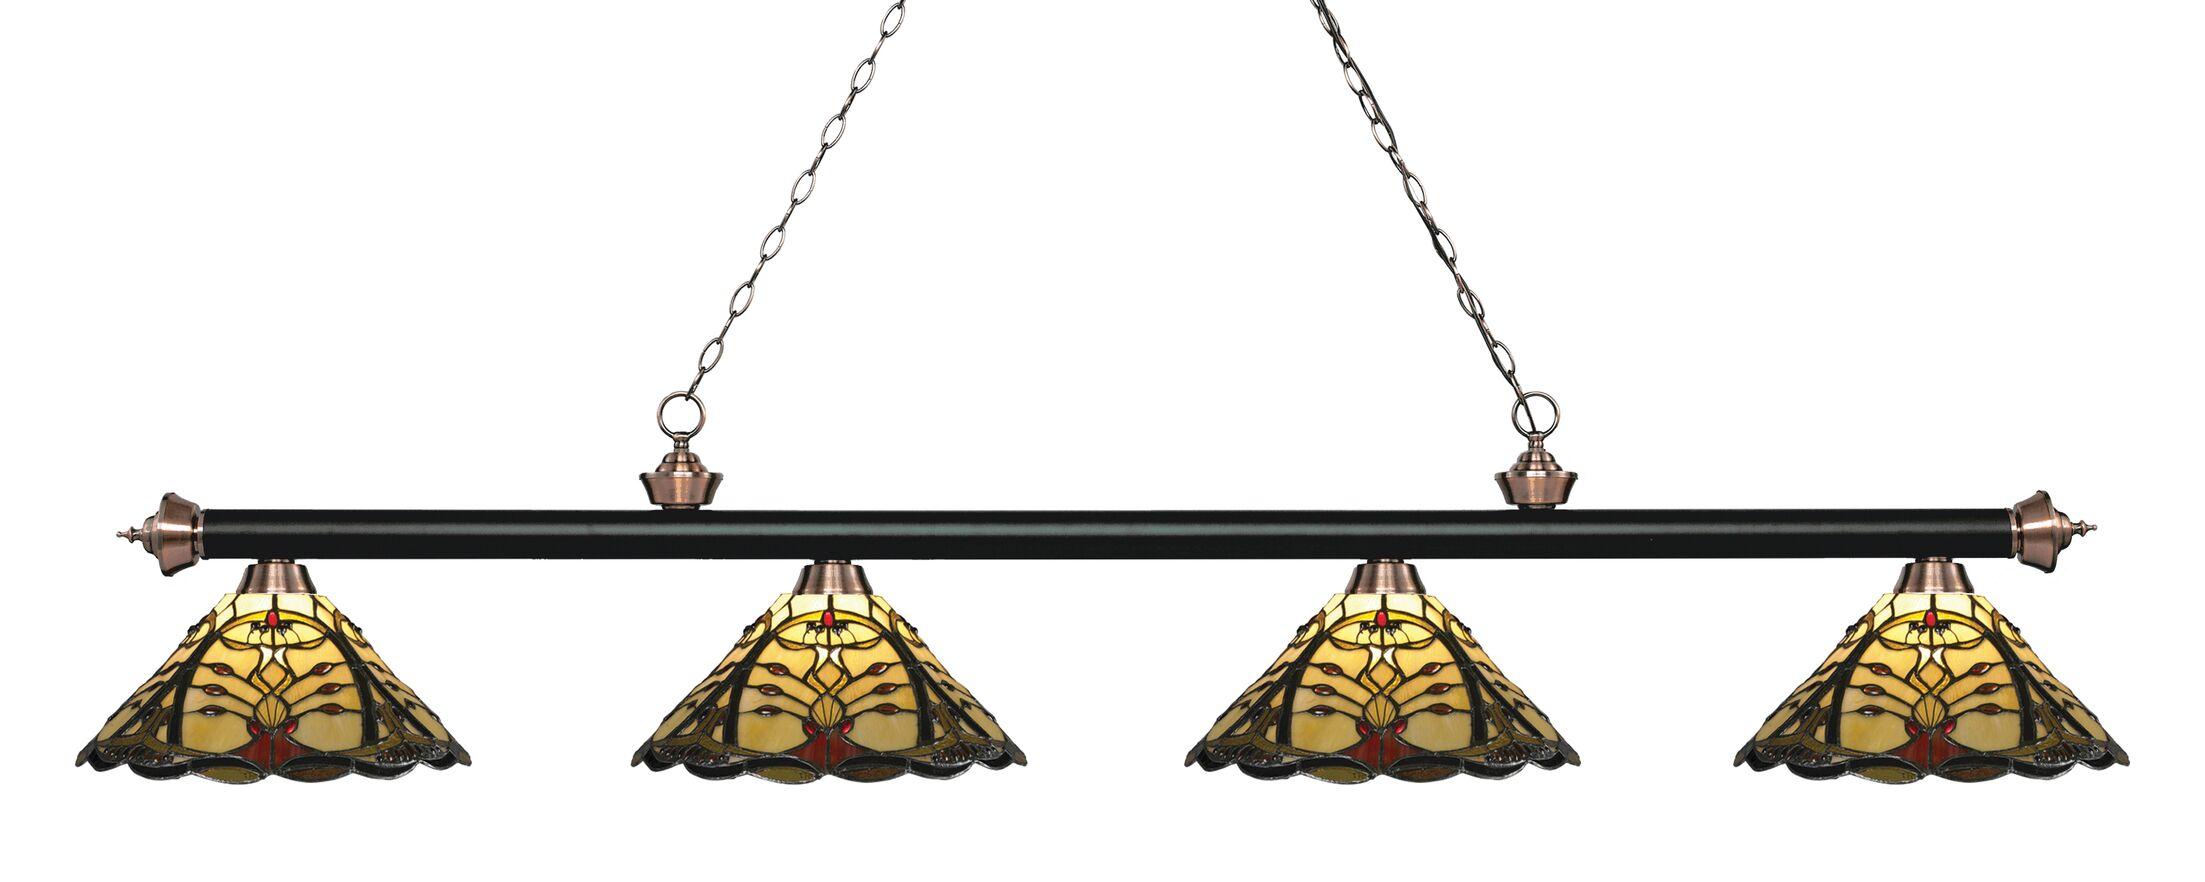 Billington 4-Light Billiard Light Color: Matte Black / Antique Copper